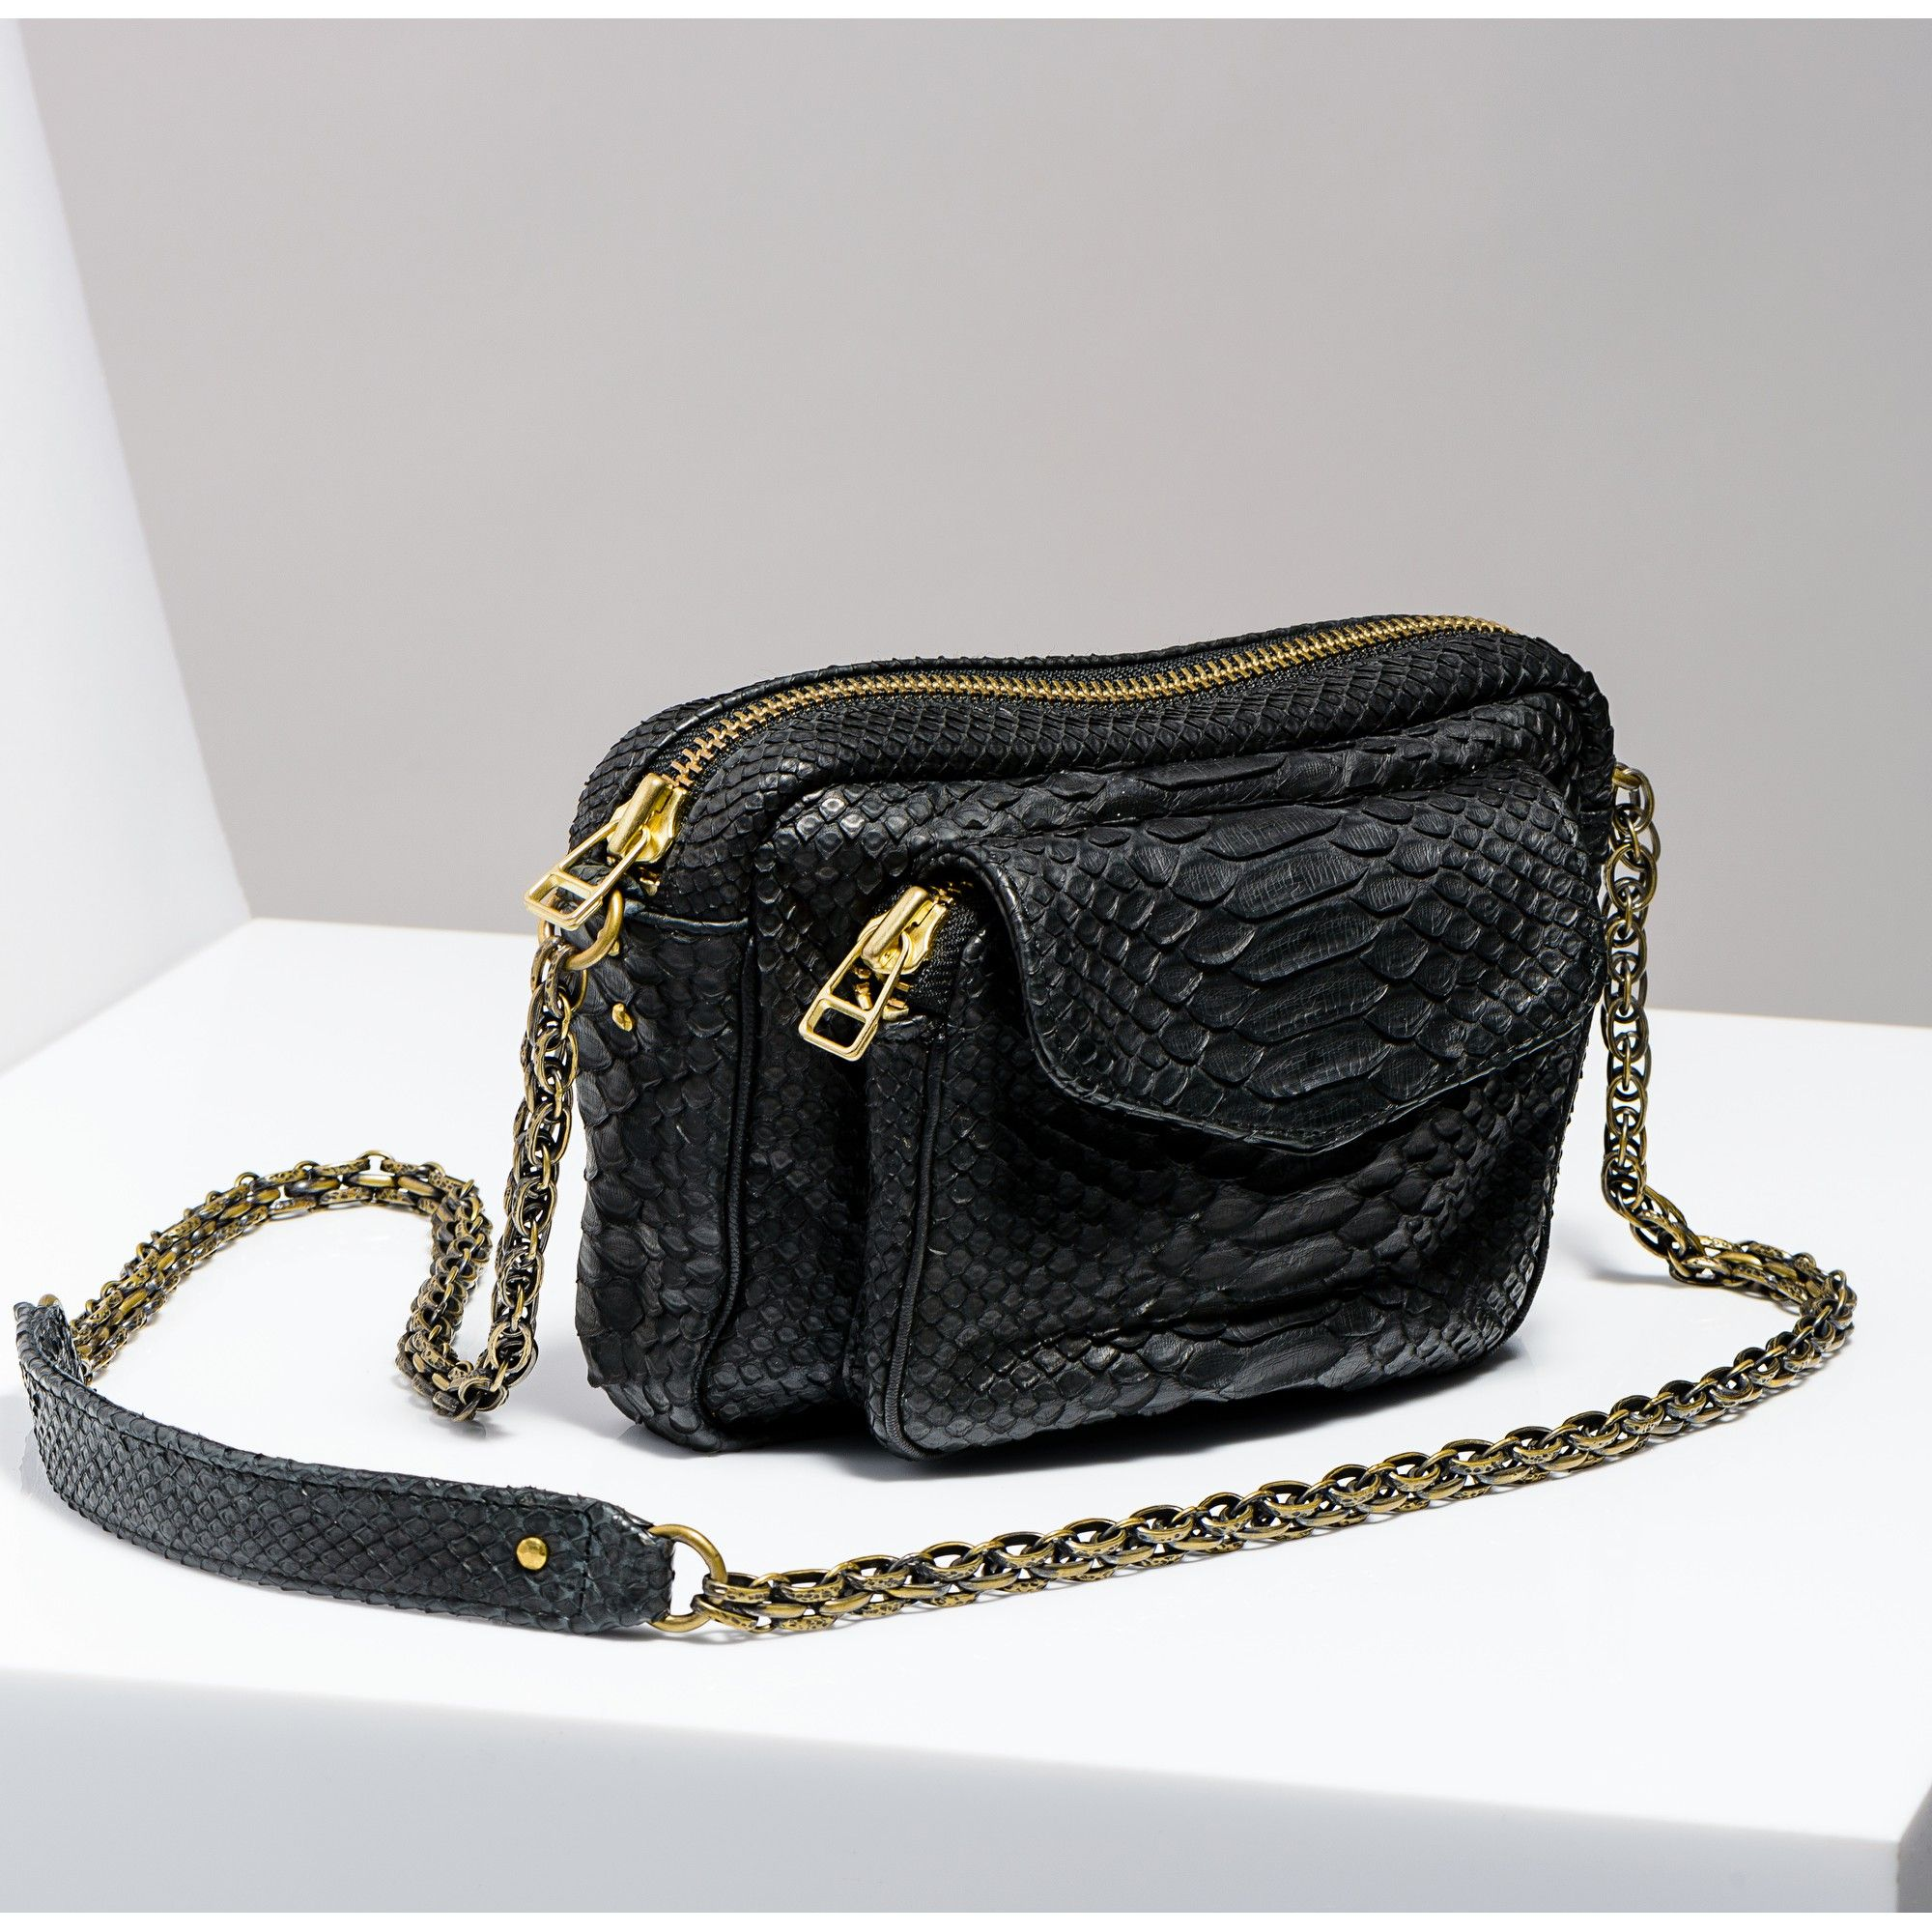 Bien connu Sac bandoulière charly noir Python   Fashion   Pinterest MD03